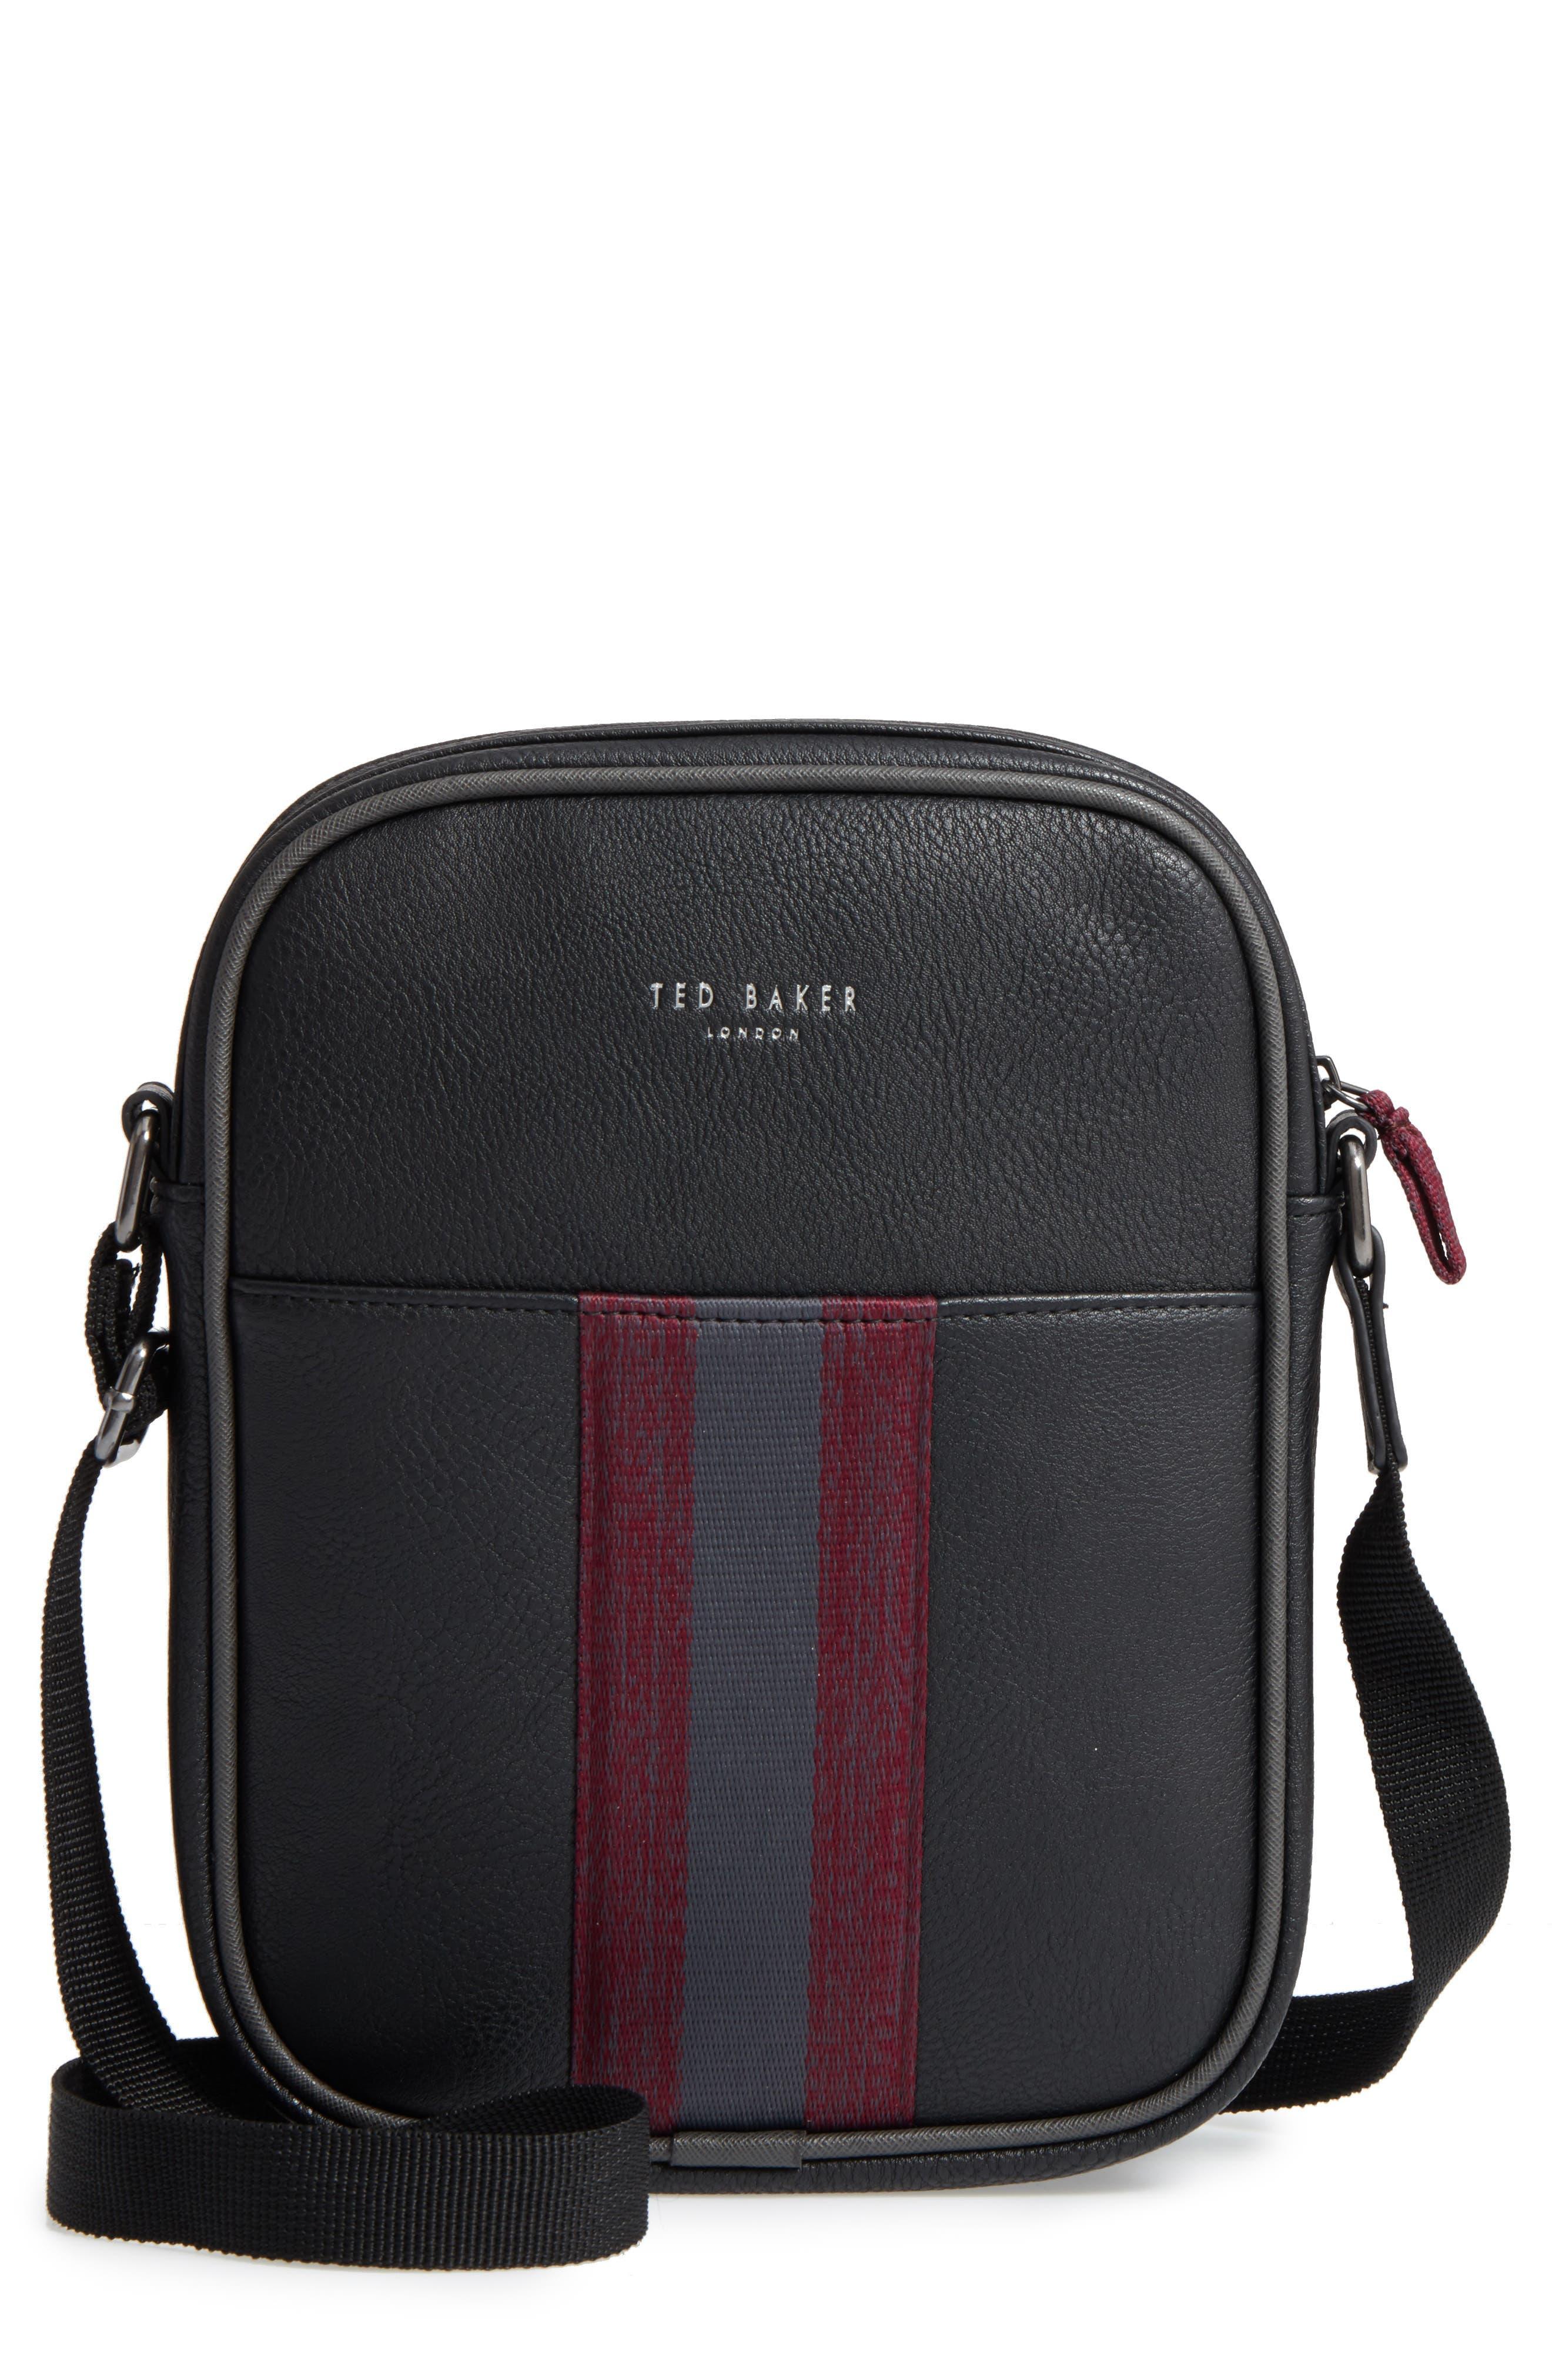 Kondoor Flight Bag,                         Main,                         color, Black